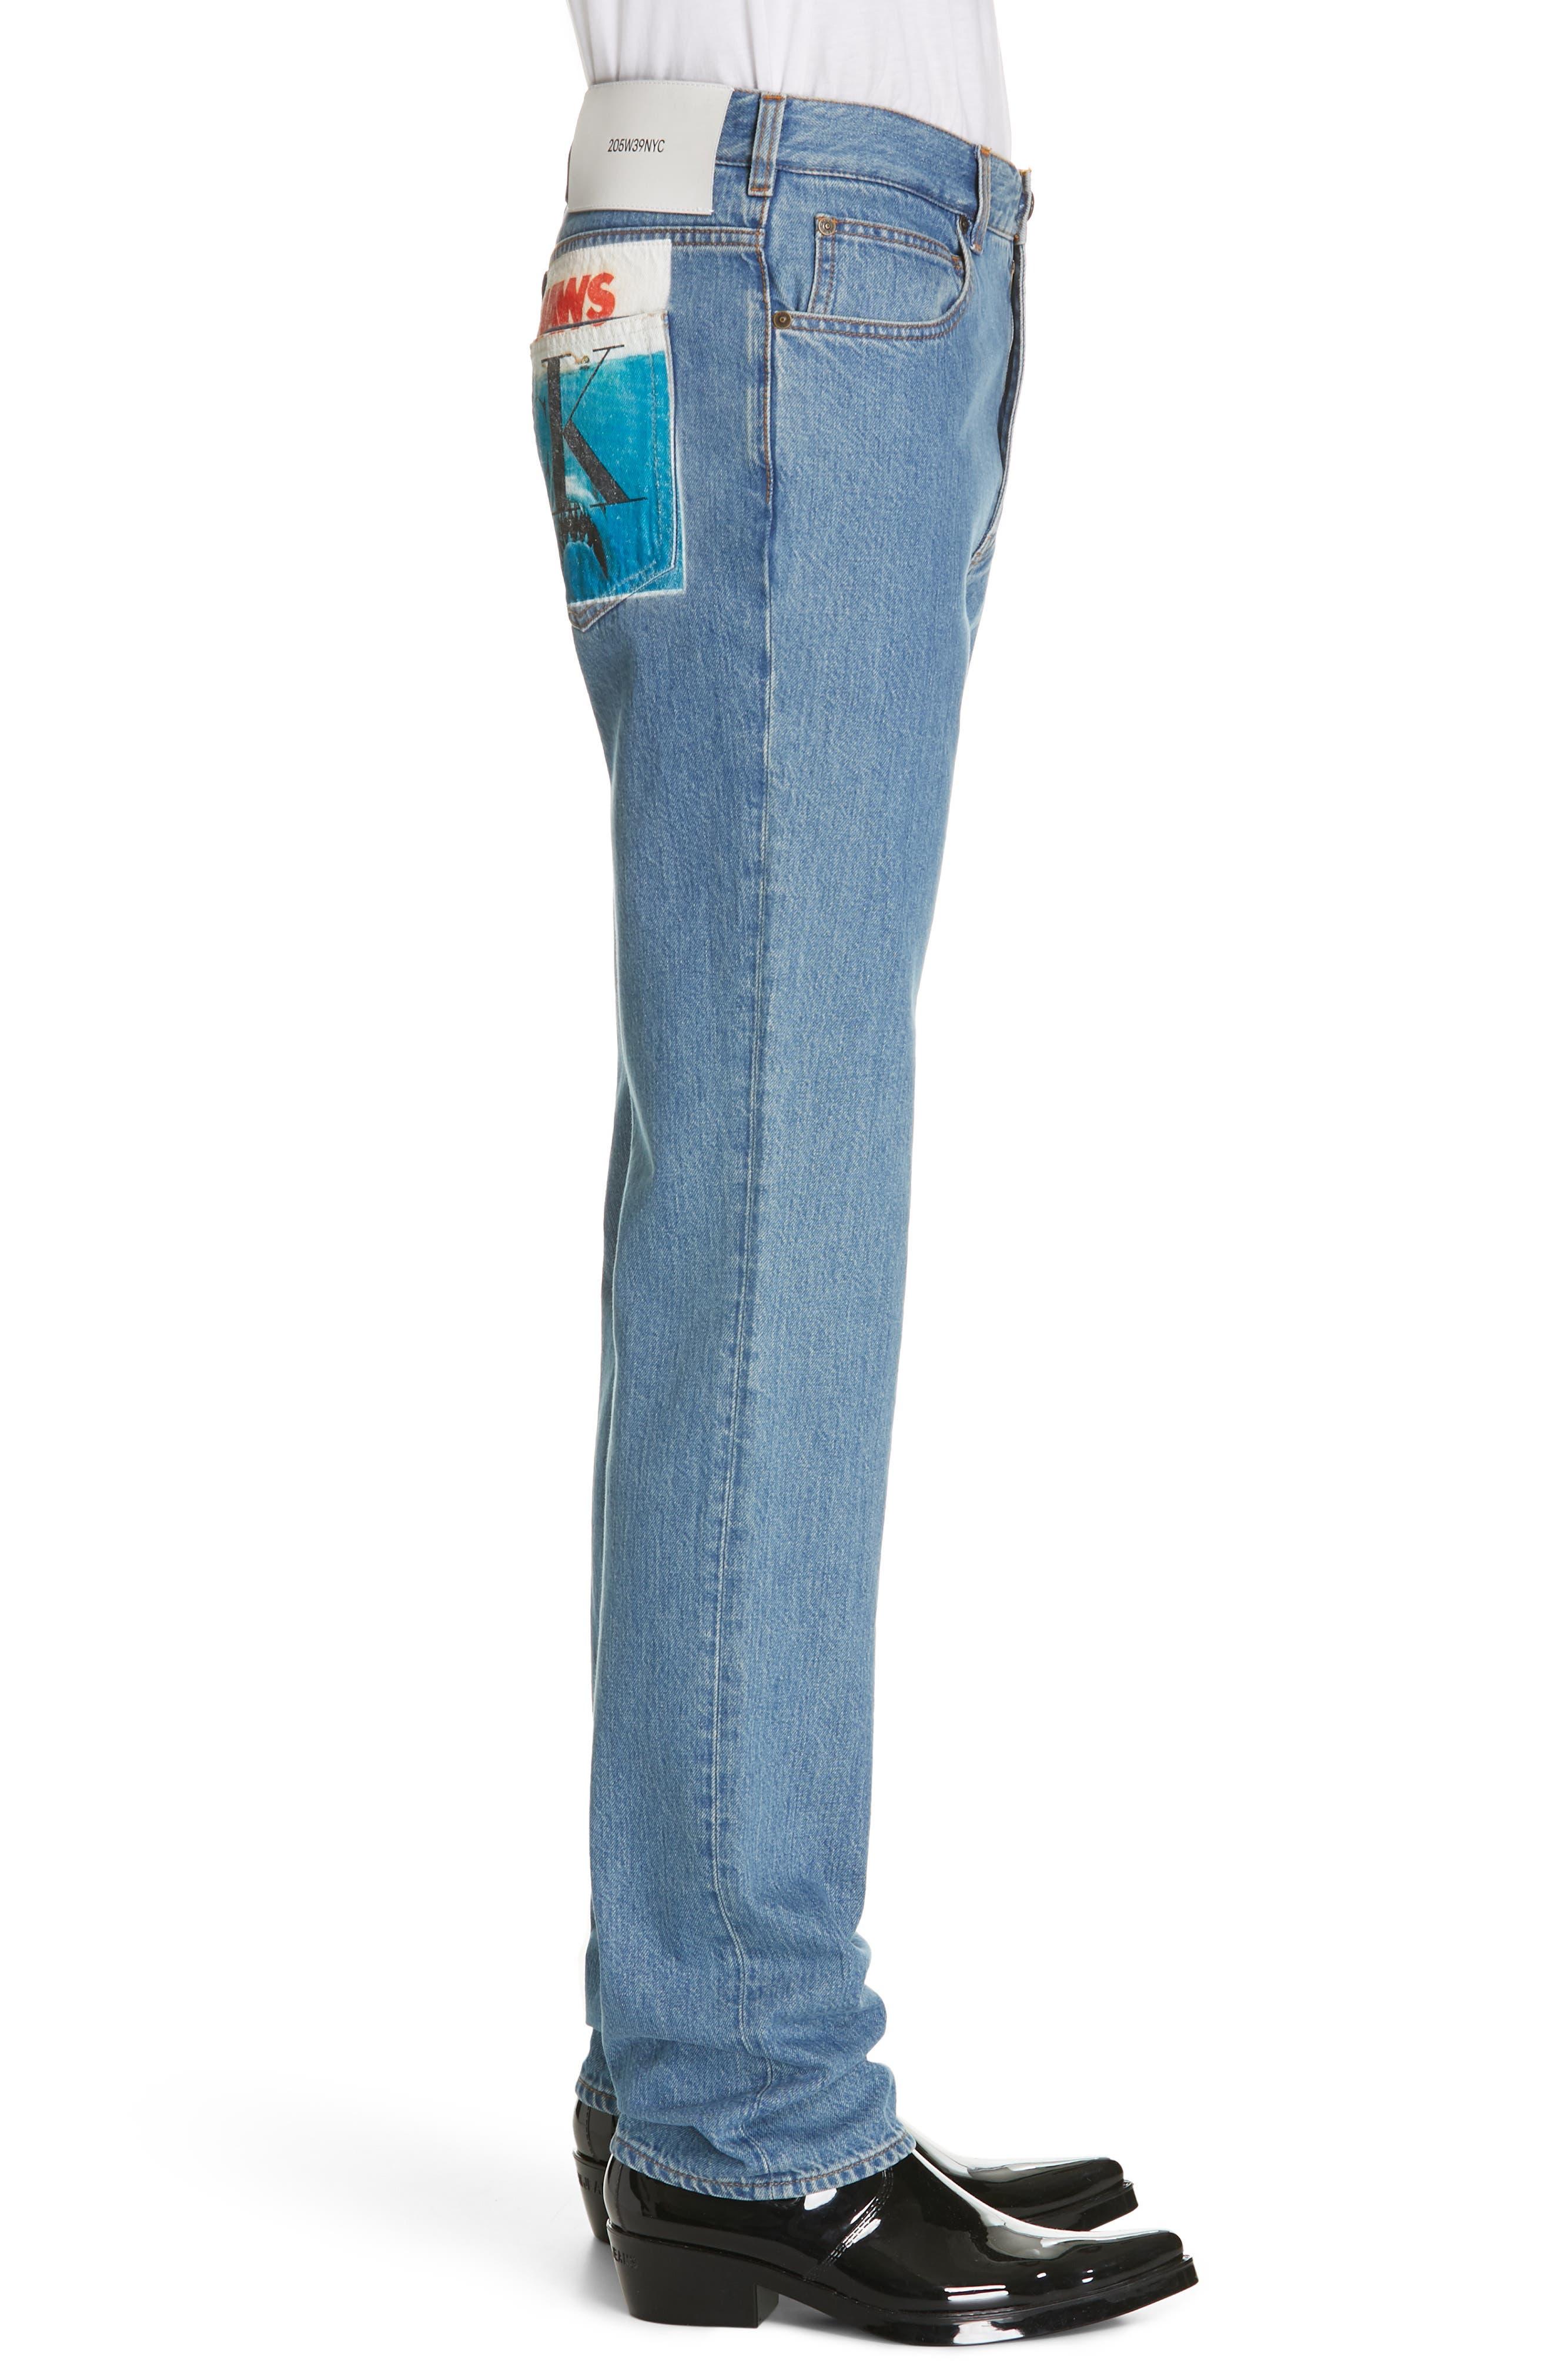 CALVIN KLEIN 205W39NYC, Jeans, Alternate thumbnail 3, color, BLUE